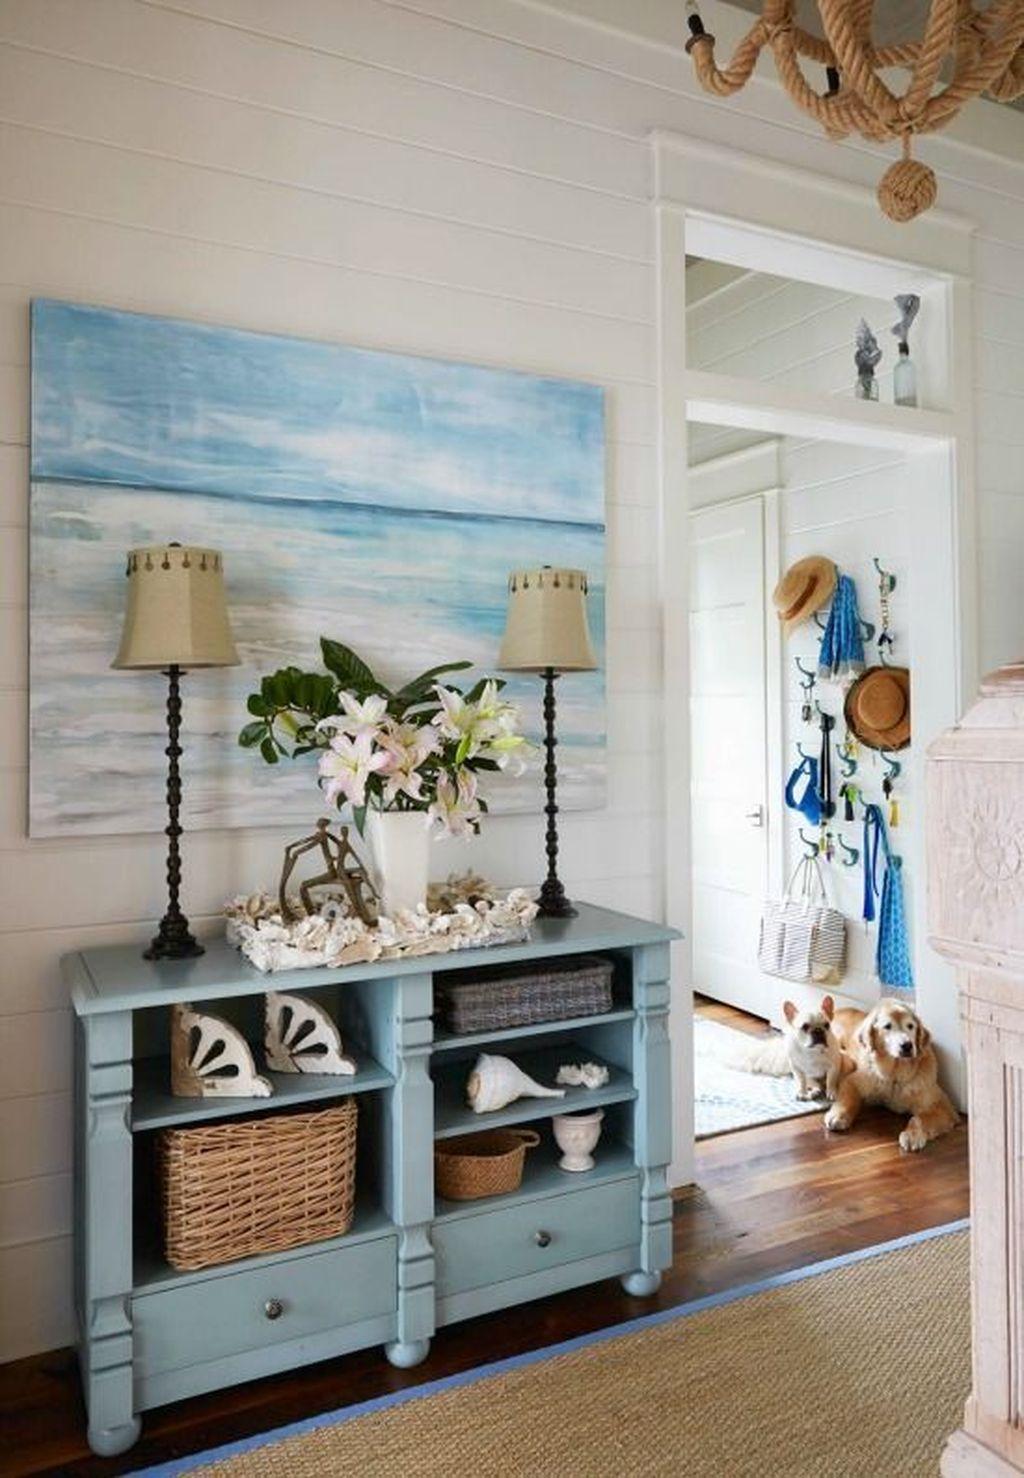 Admirable Beach House Decor Ideas You Should Copy 25